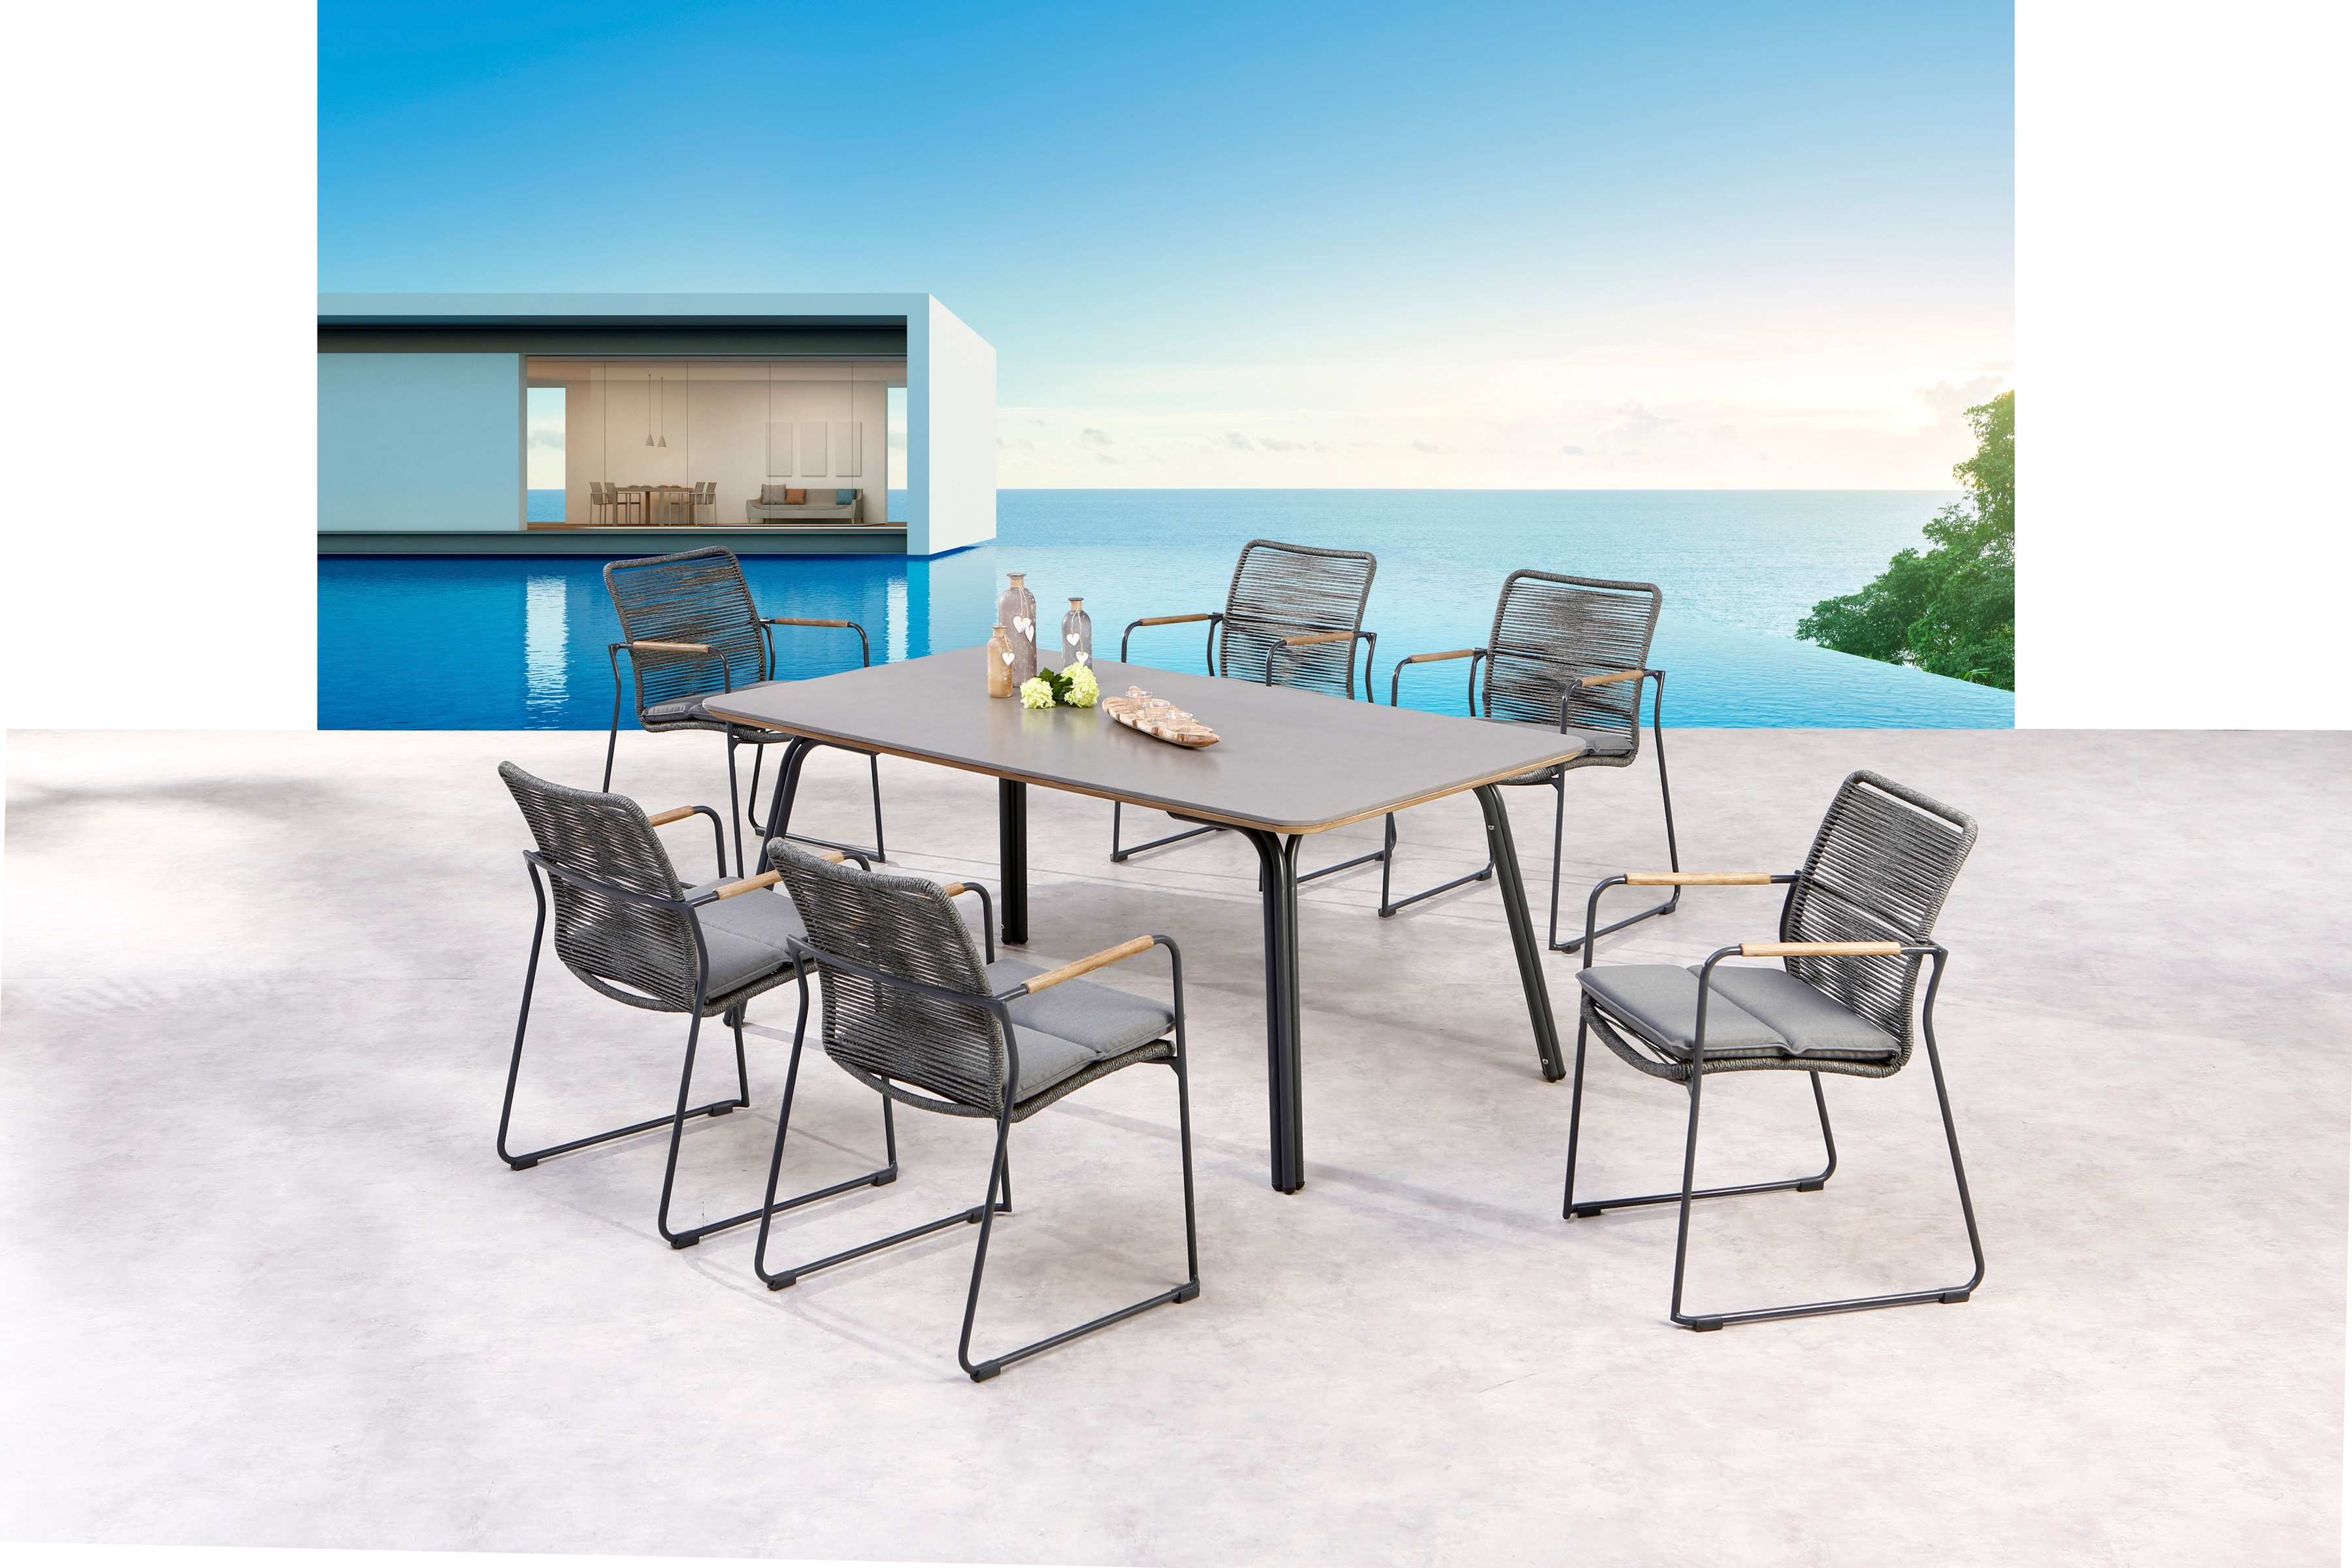 BEST Gartenmöbelset Bormio 7-tlg 6 Sessel Tisch 180x100 cm inkl Sitzkissen